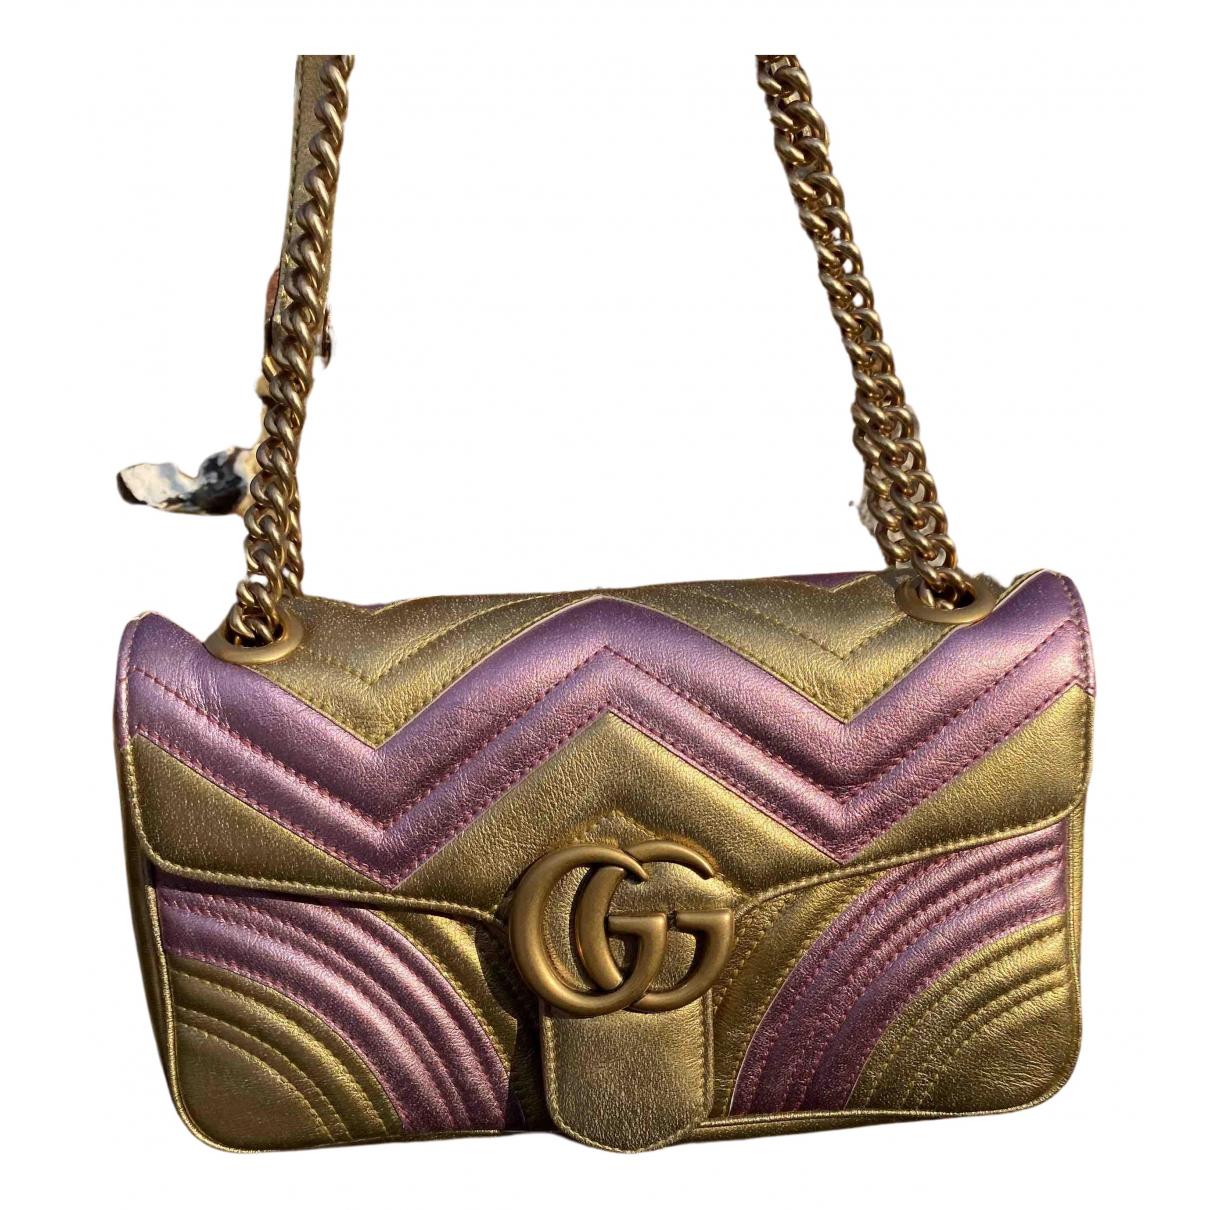 Gucci Marmont Metallic Leather handbag for Women N